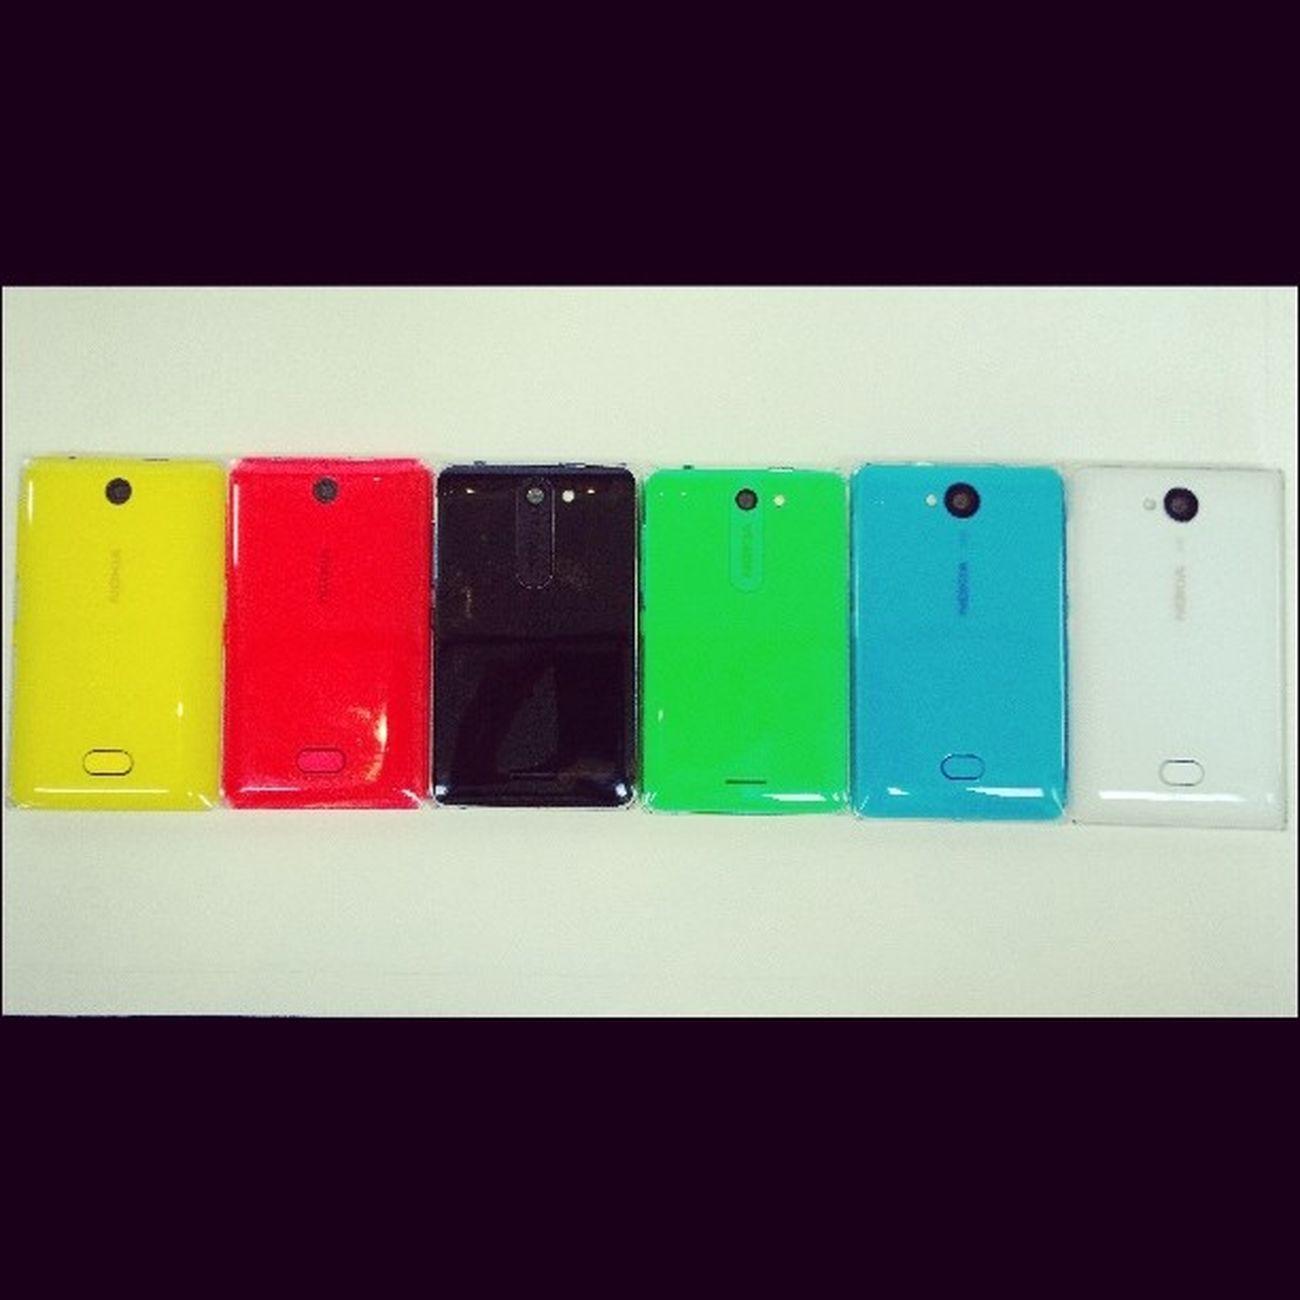 Nokia  Asha500 - желтая и красная, Nokia  Asha502 - черная и зеленая, Nokia Asha503 - голубая и белая. nokiaworld nokiaworldkz